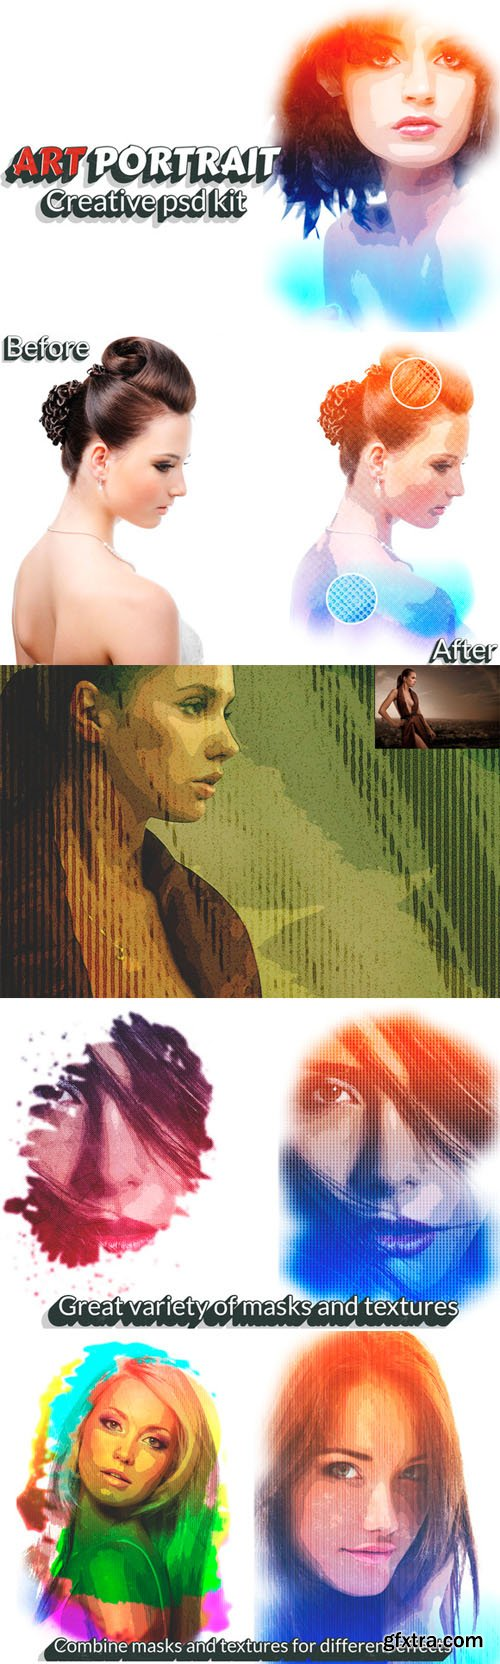 "CM - ""Art Portrait"" - Creative psd kit 138904"